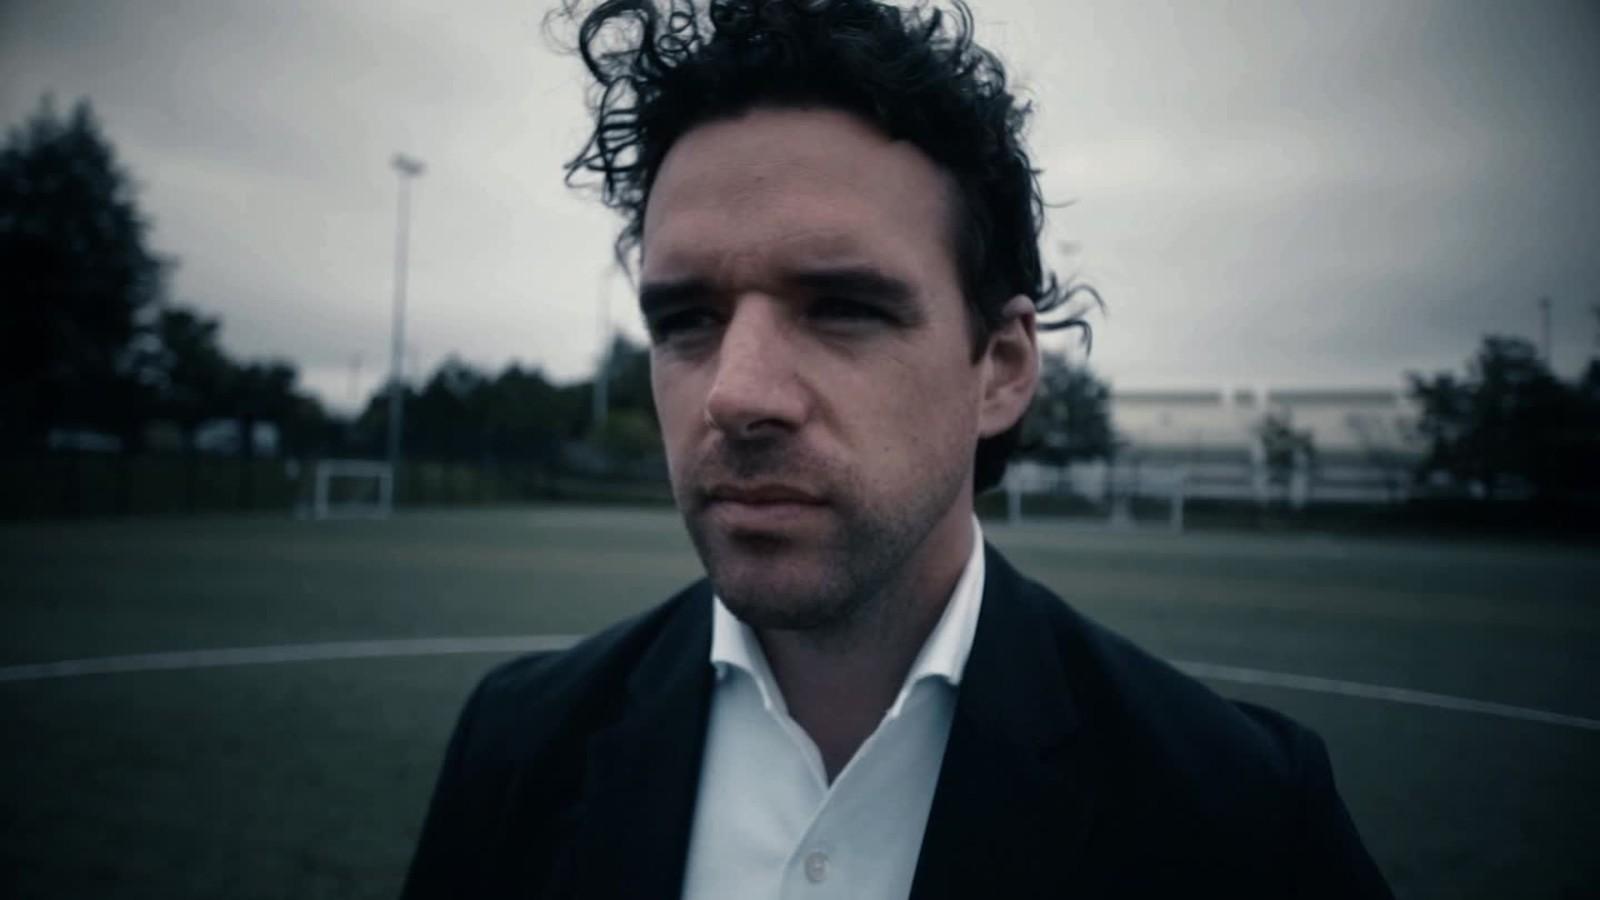 Owen hargreaves talks penalty shootout pressures at euro 2016 cnn altavistaventures Gallery